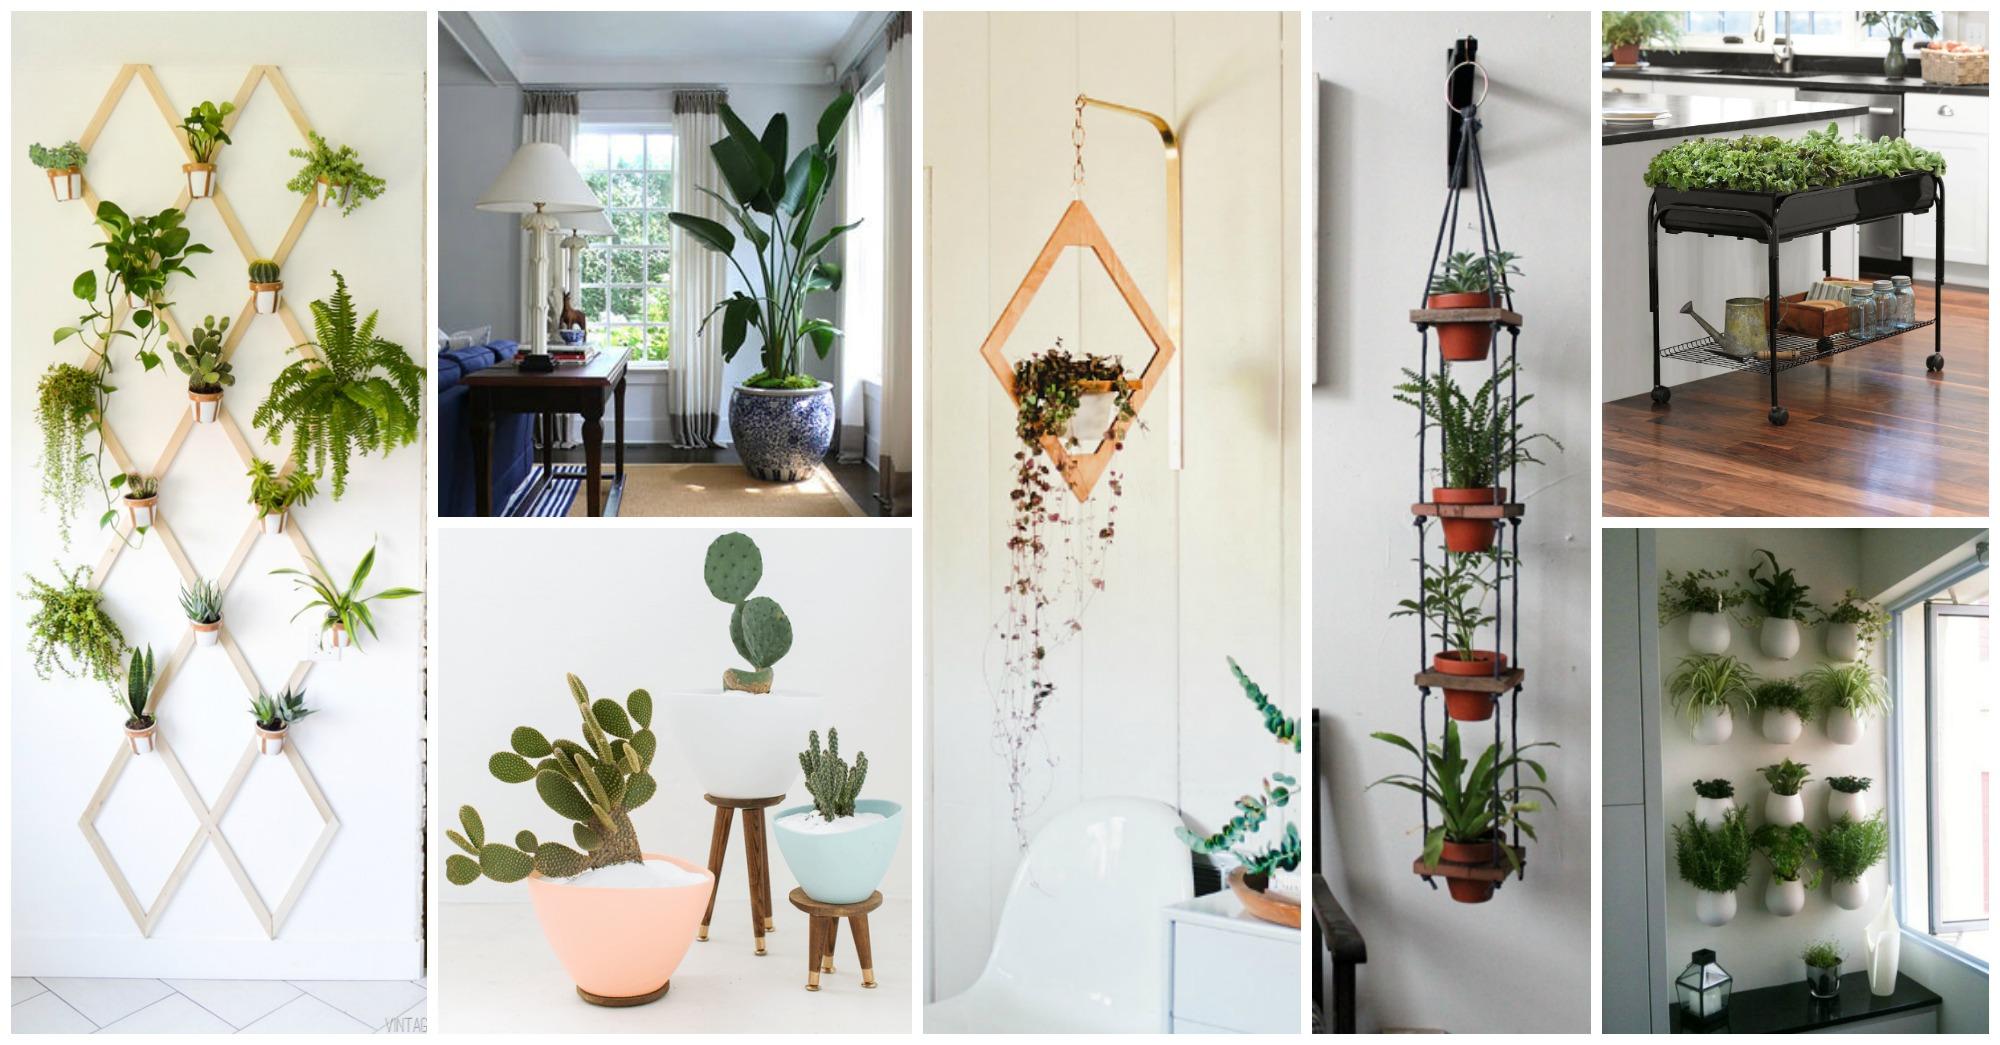 17 Indoor Gardens That Will Blow Your Mind